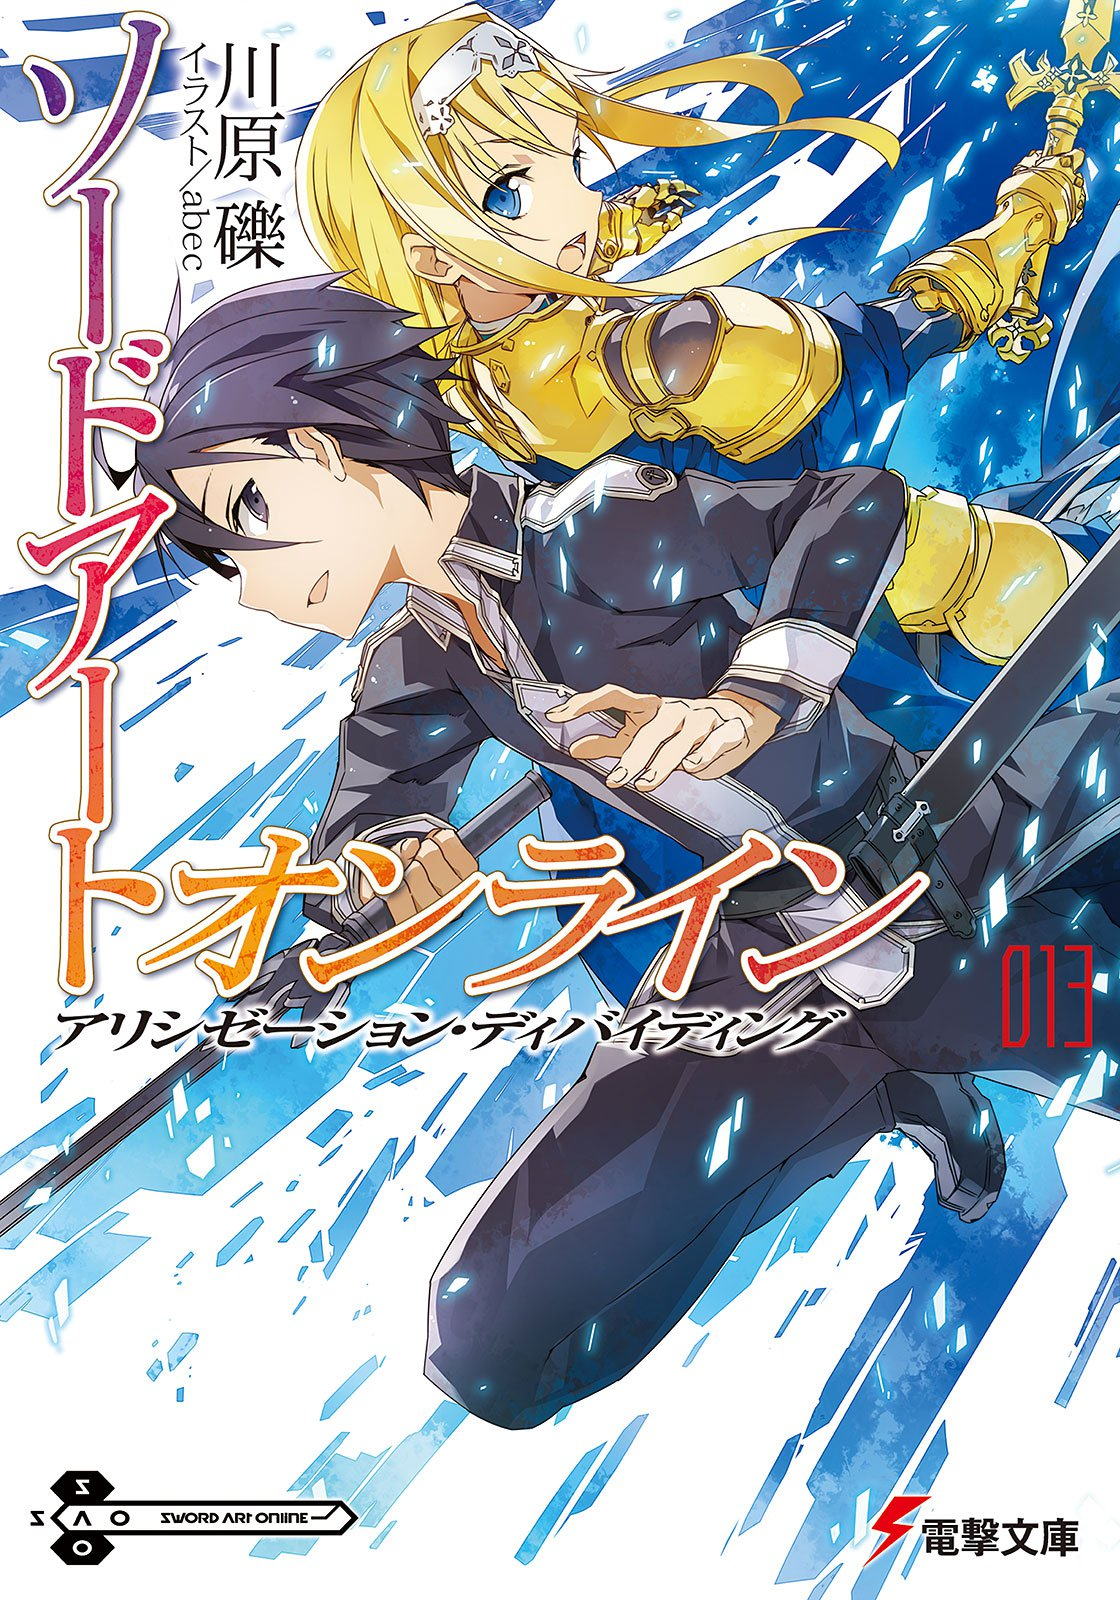 Novel Sword Art Online Bahasa Indonesia Pdf